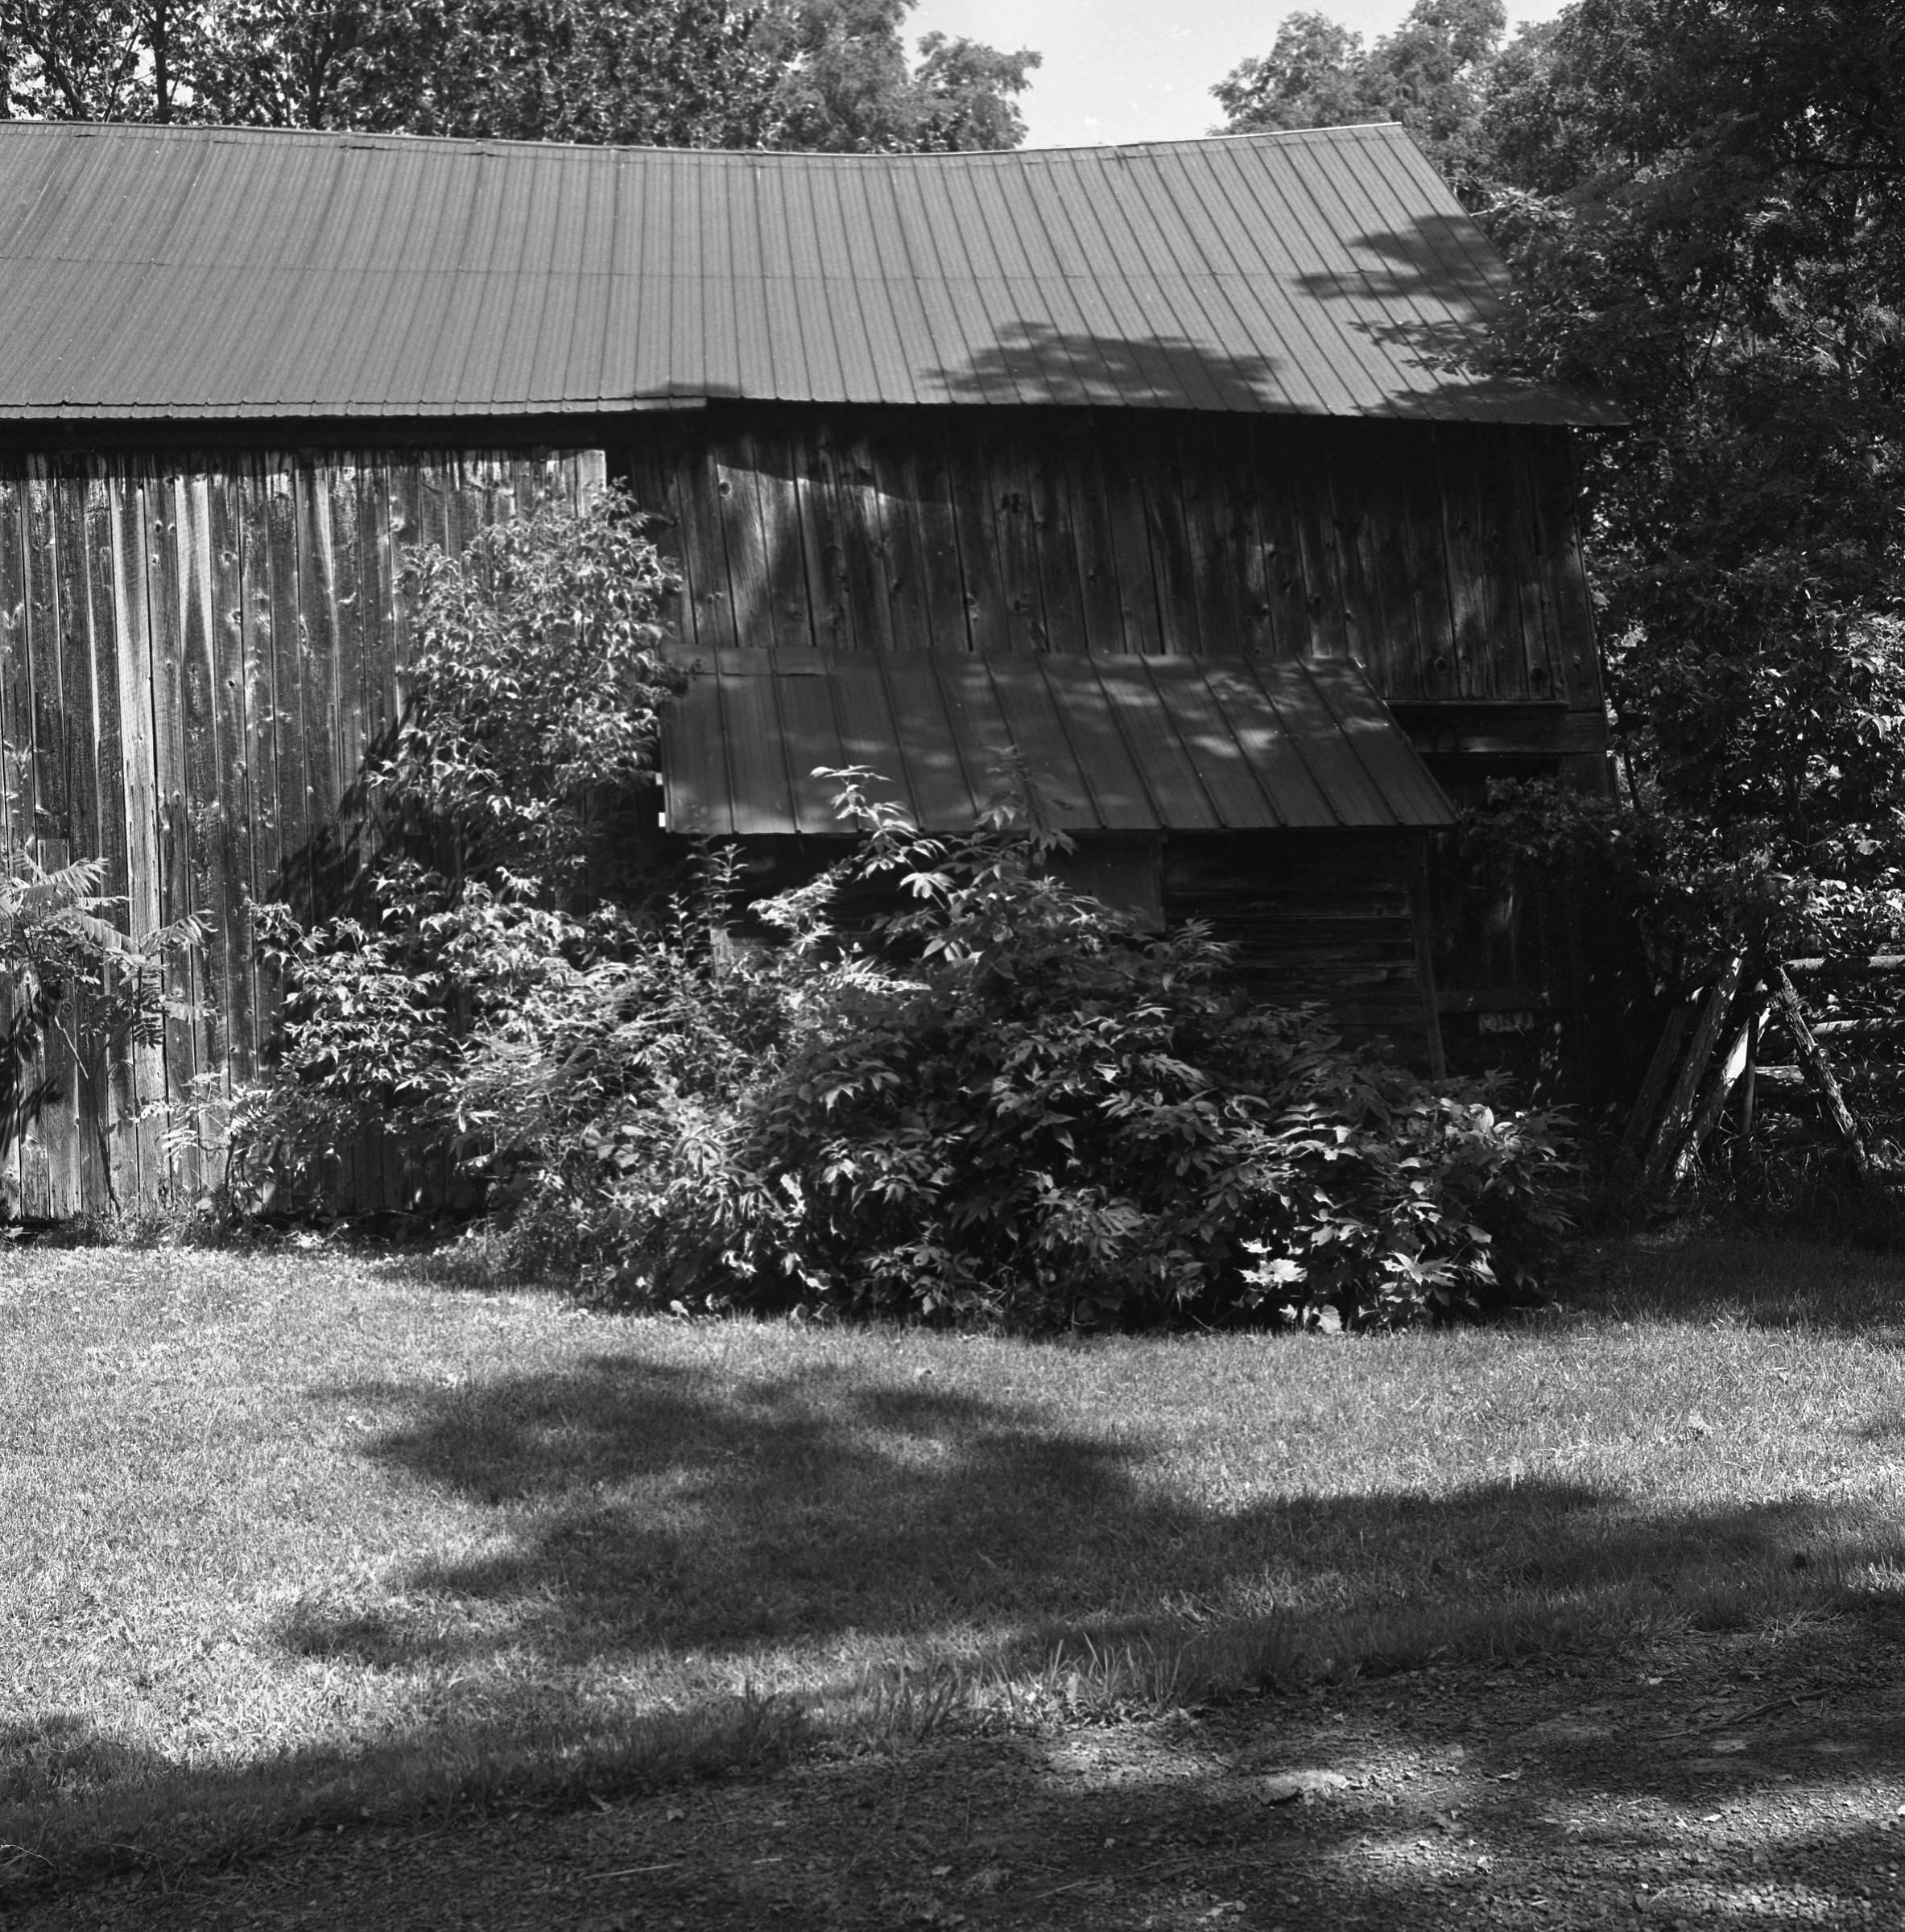 Lost Lake Barn 2017-08-30  Large  img597.jpg